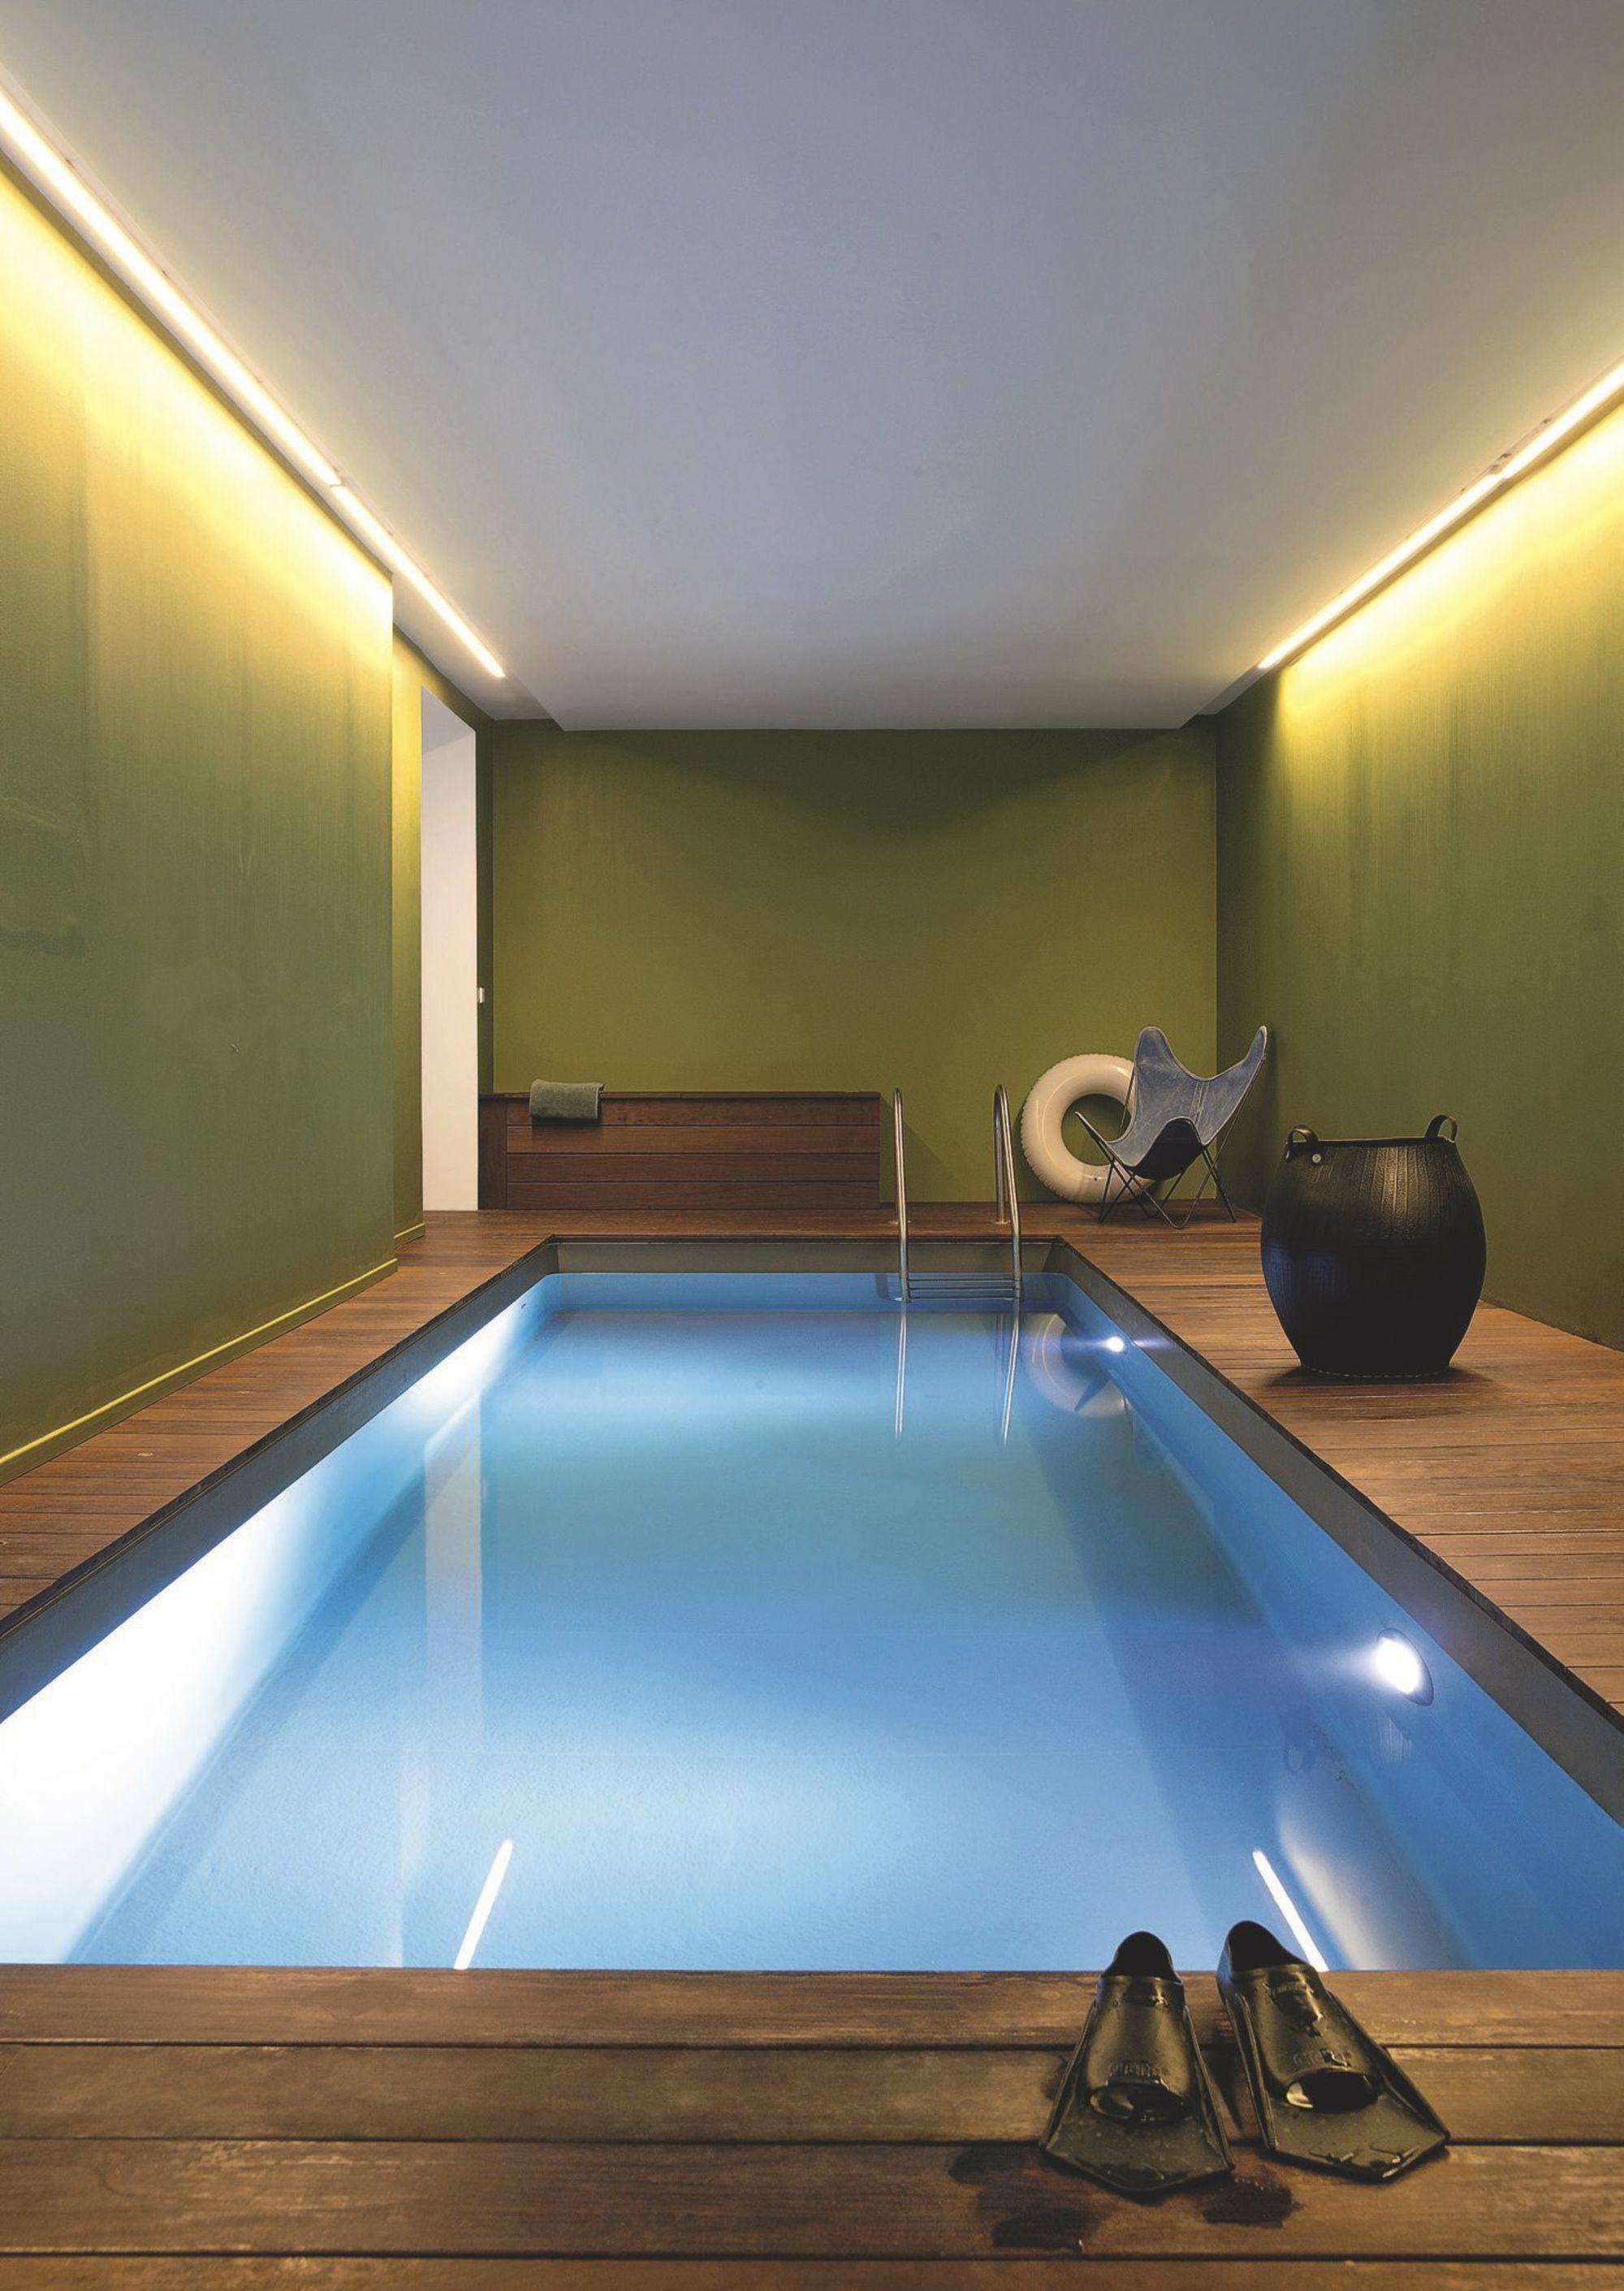 piscine-annabel-gueret_5272839